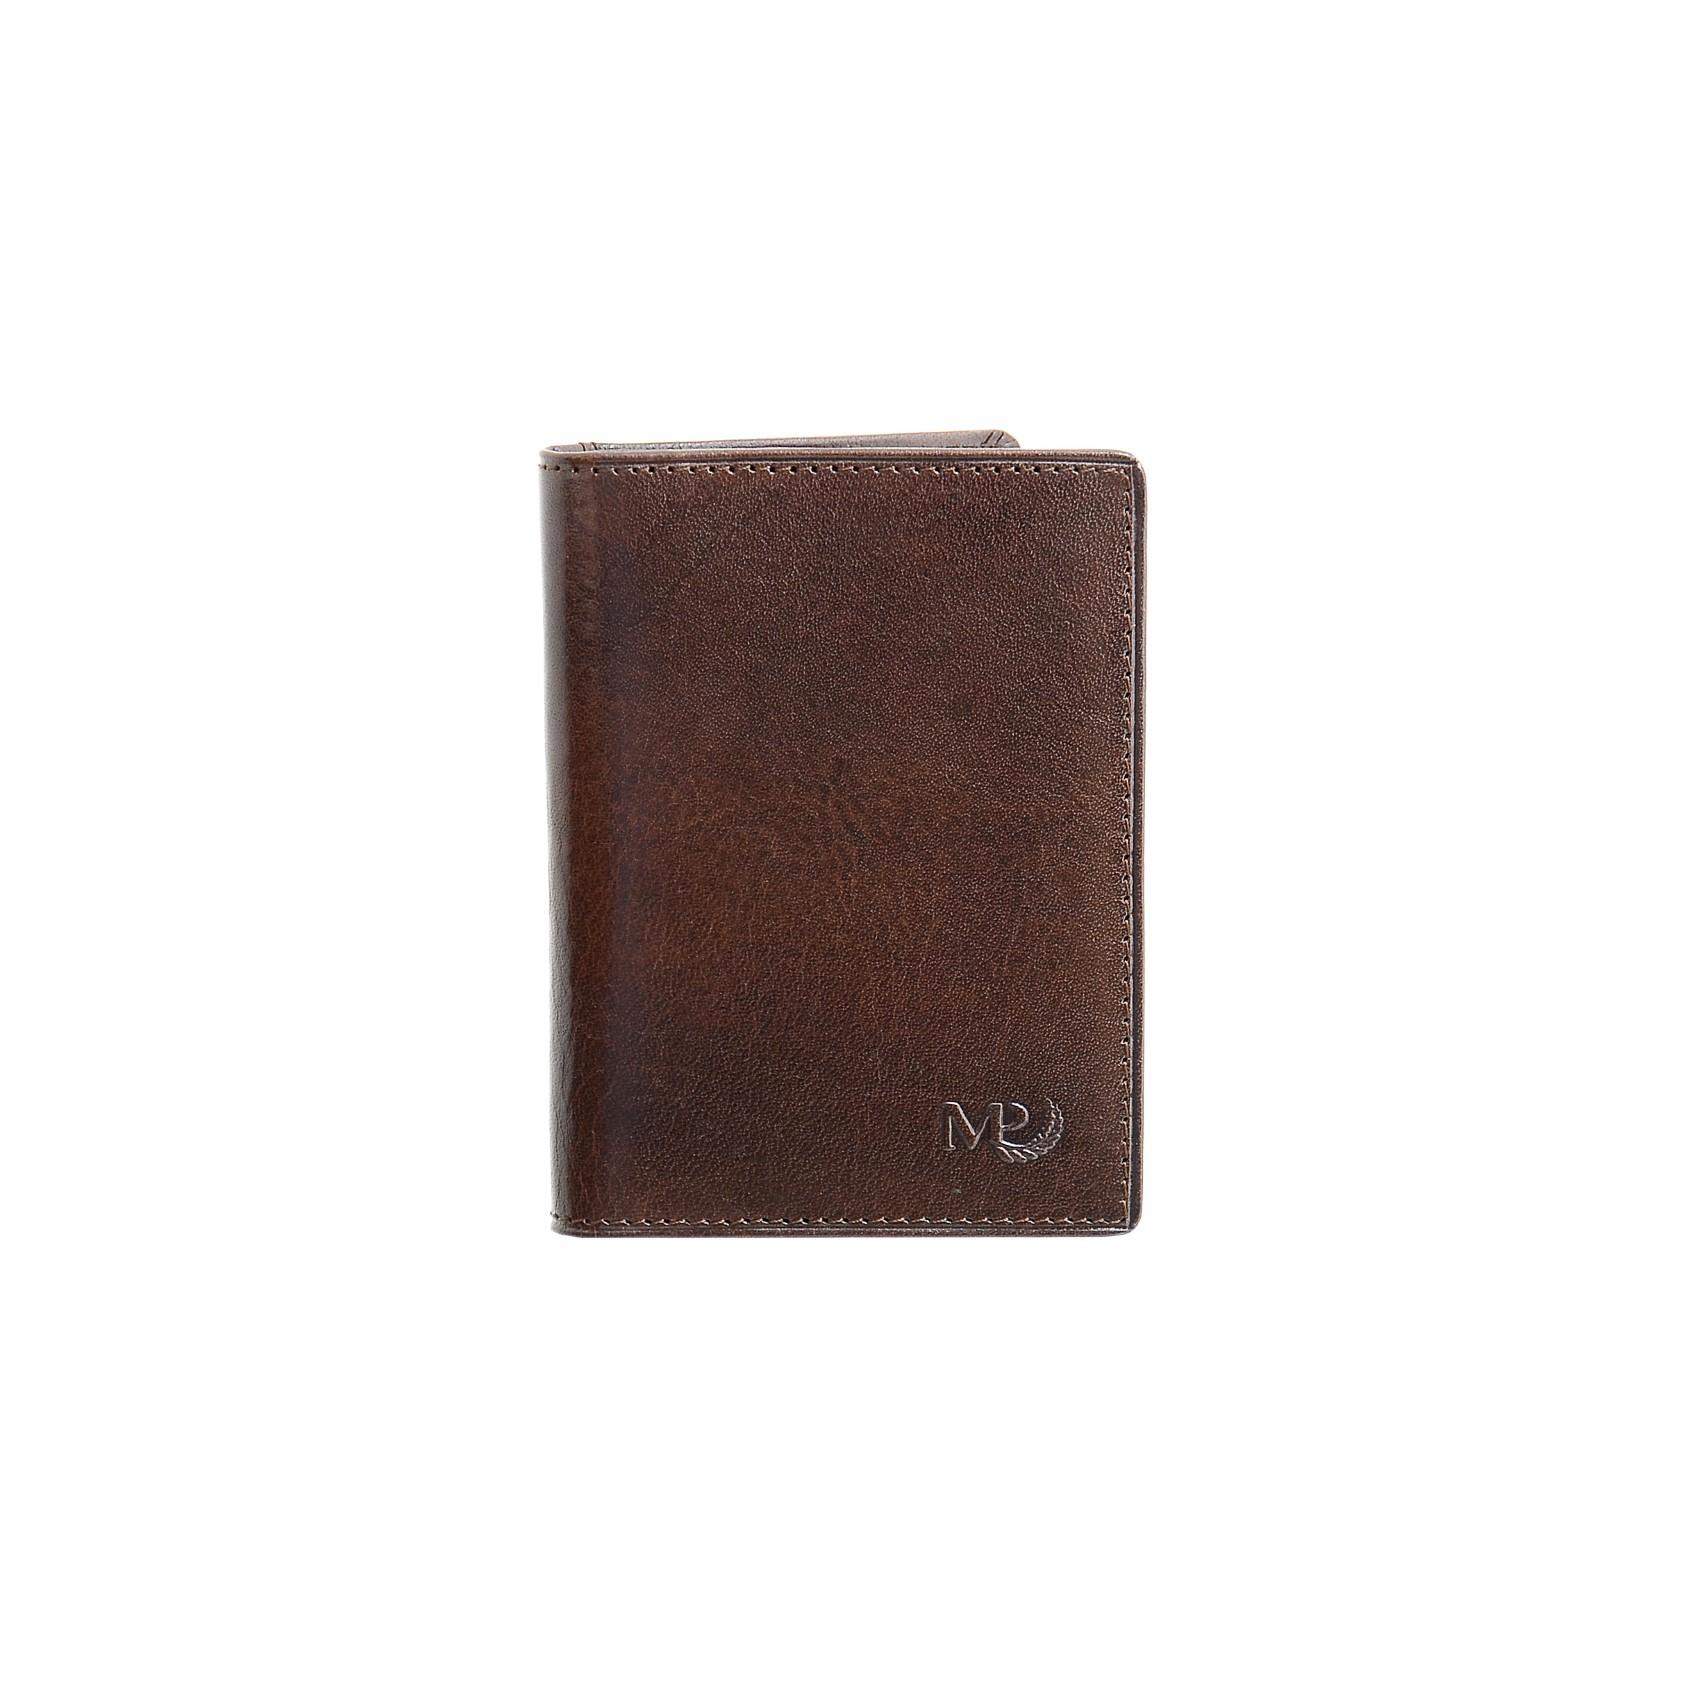 B120249 Ruf - Футляр для карт MP